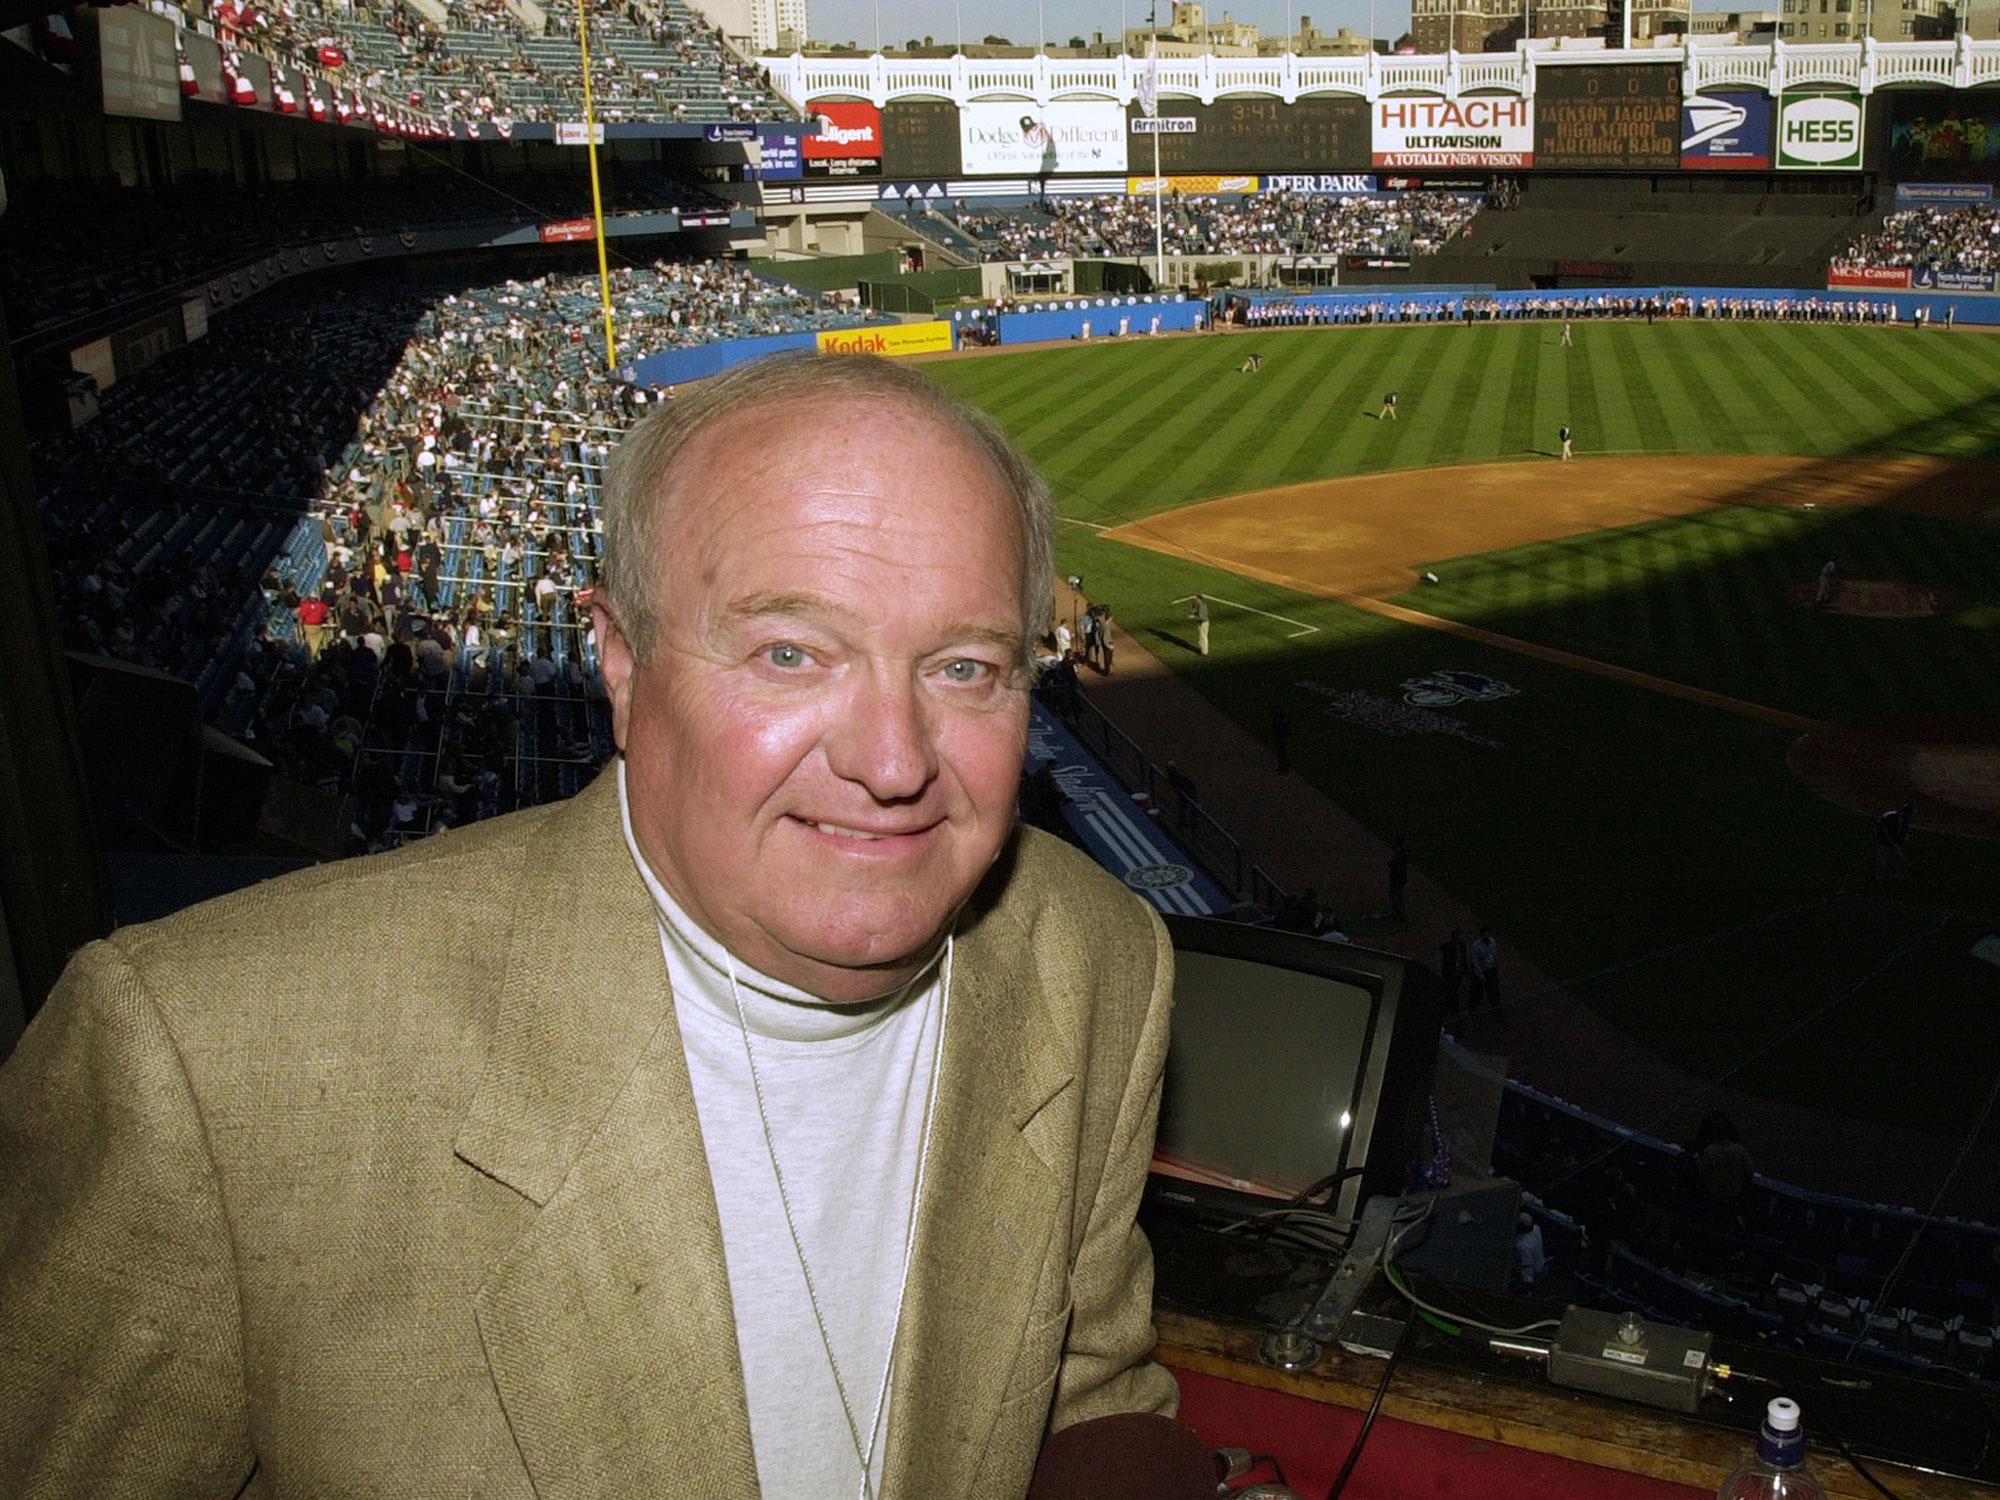 Dave Niehaus, Seattle Mariners broadcaster